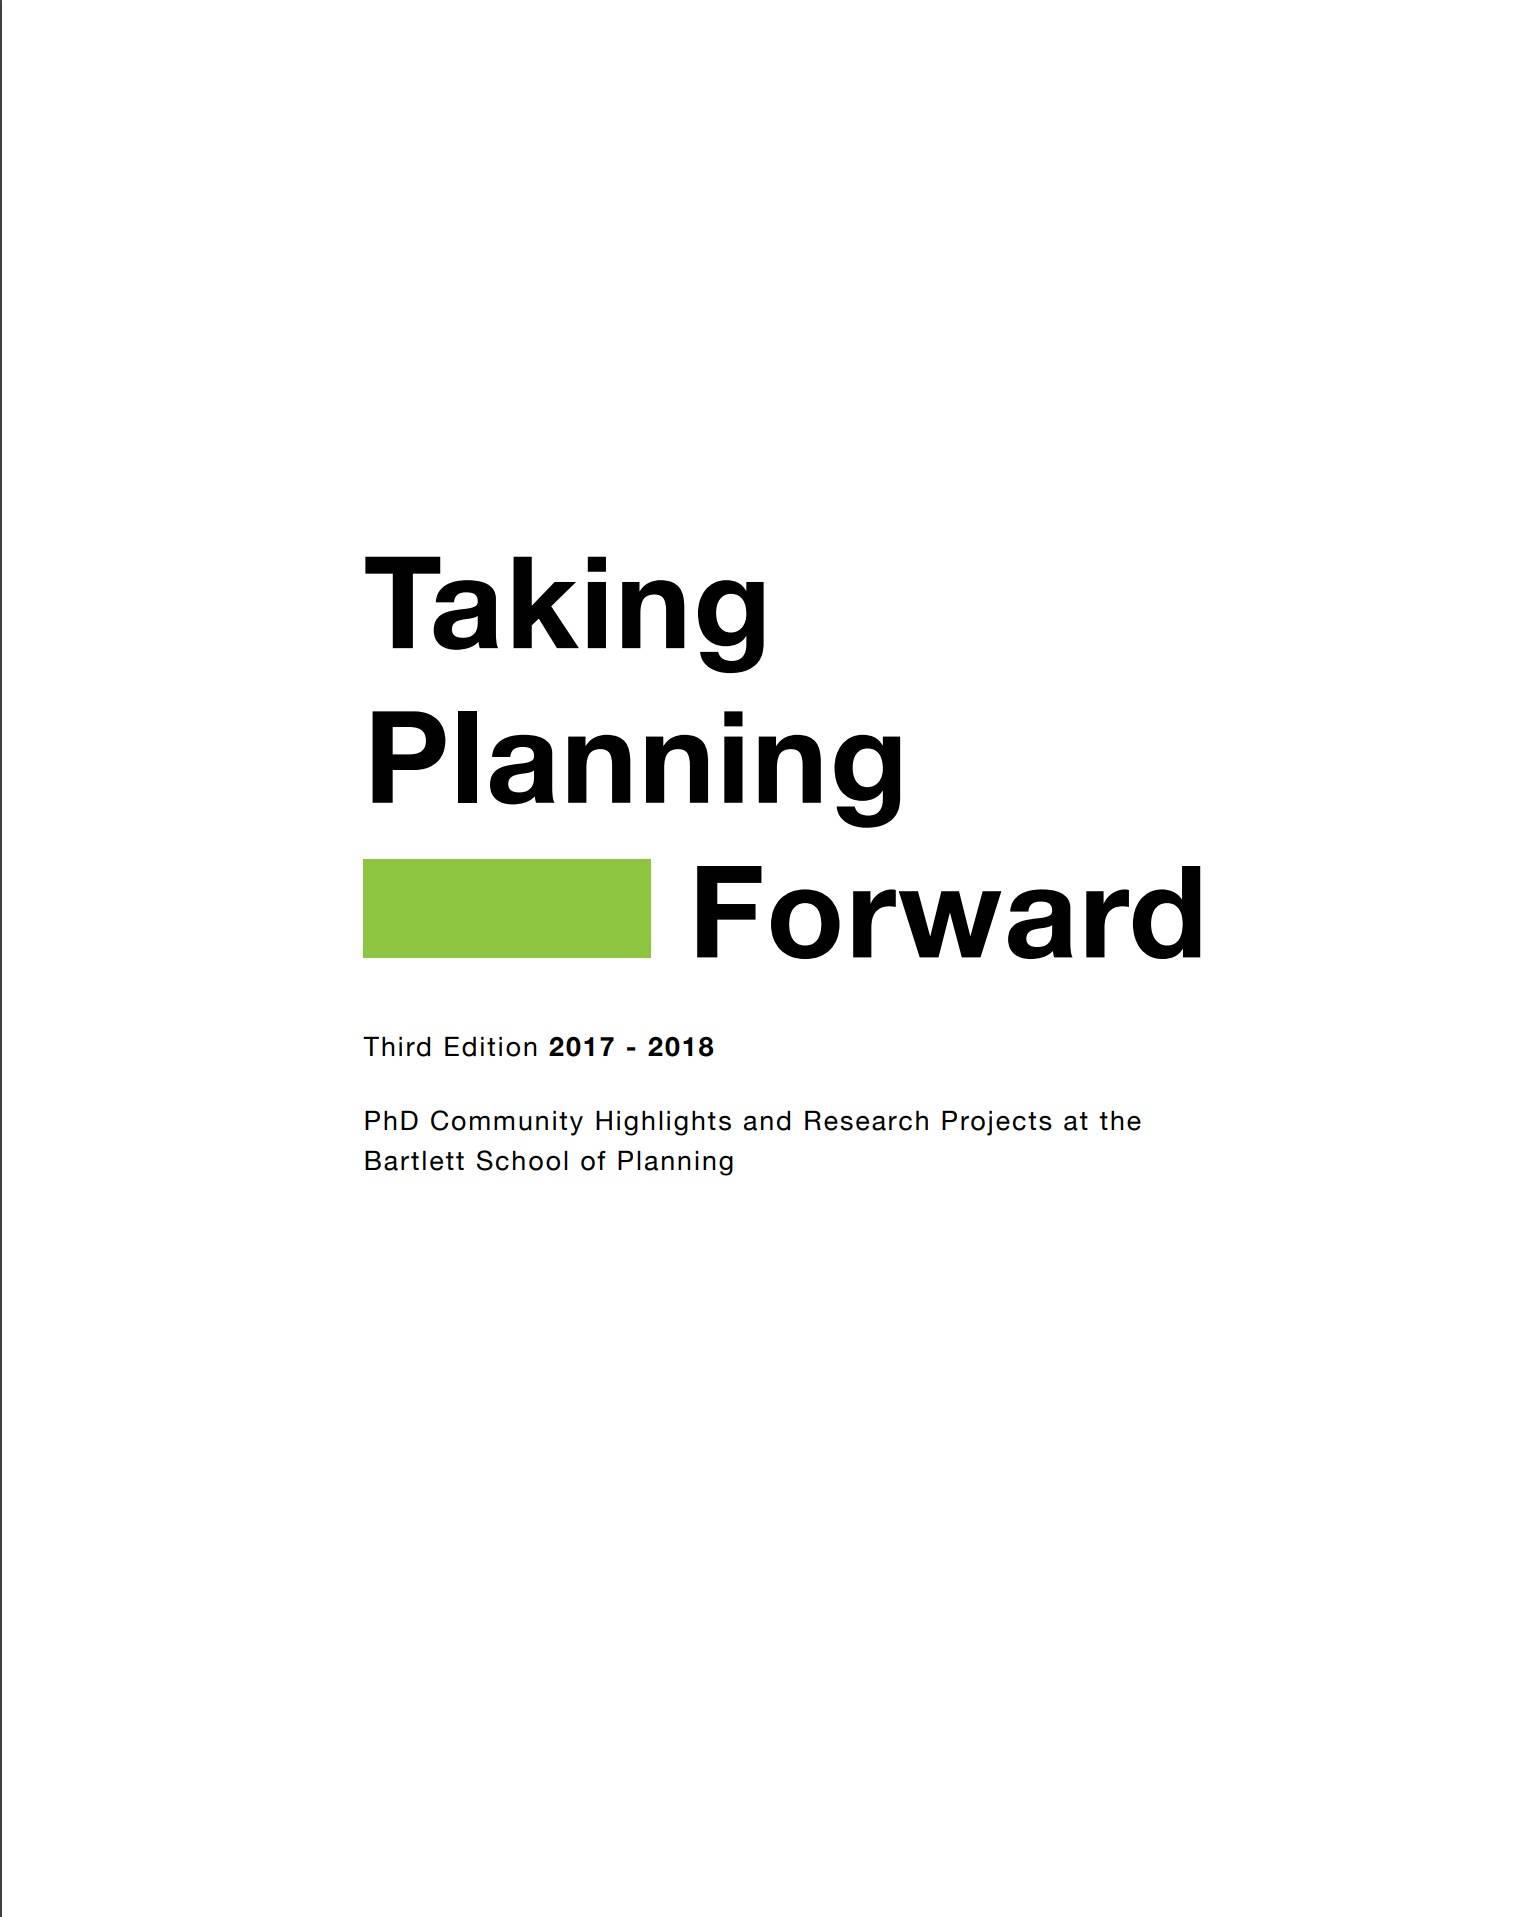 Taking planning forward 3